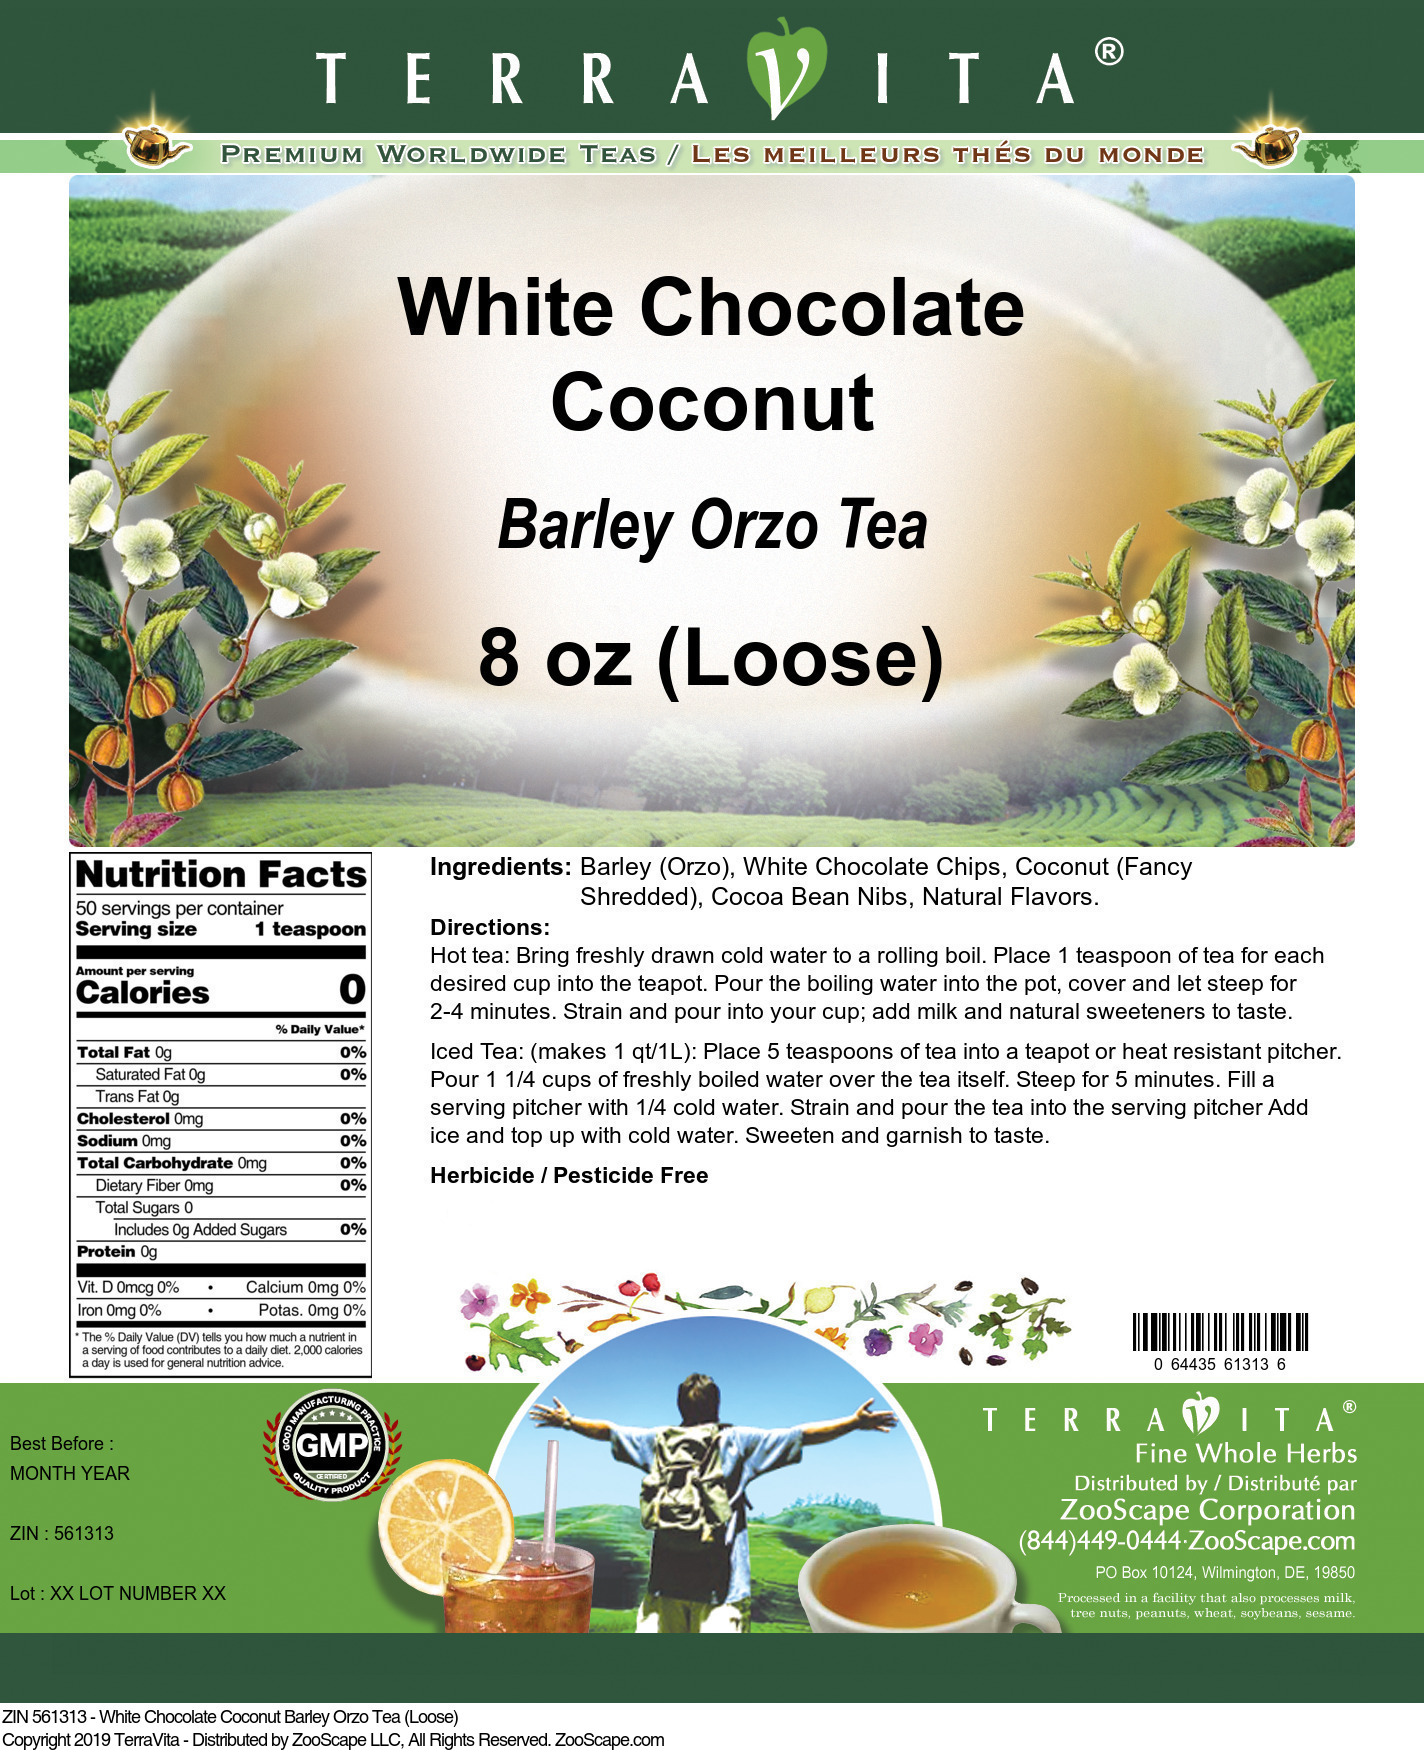 White Chocolate Coconut Barley Orzo